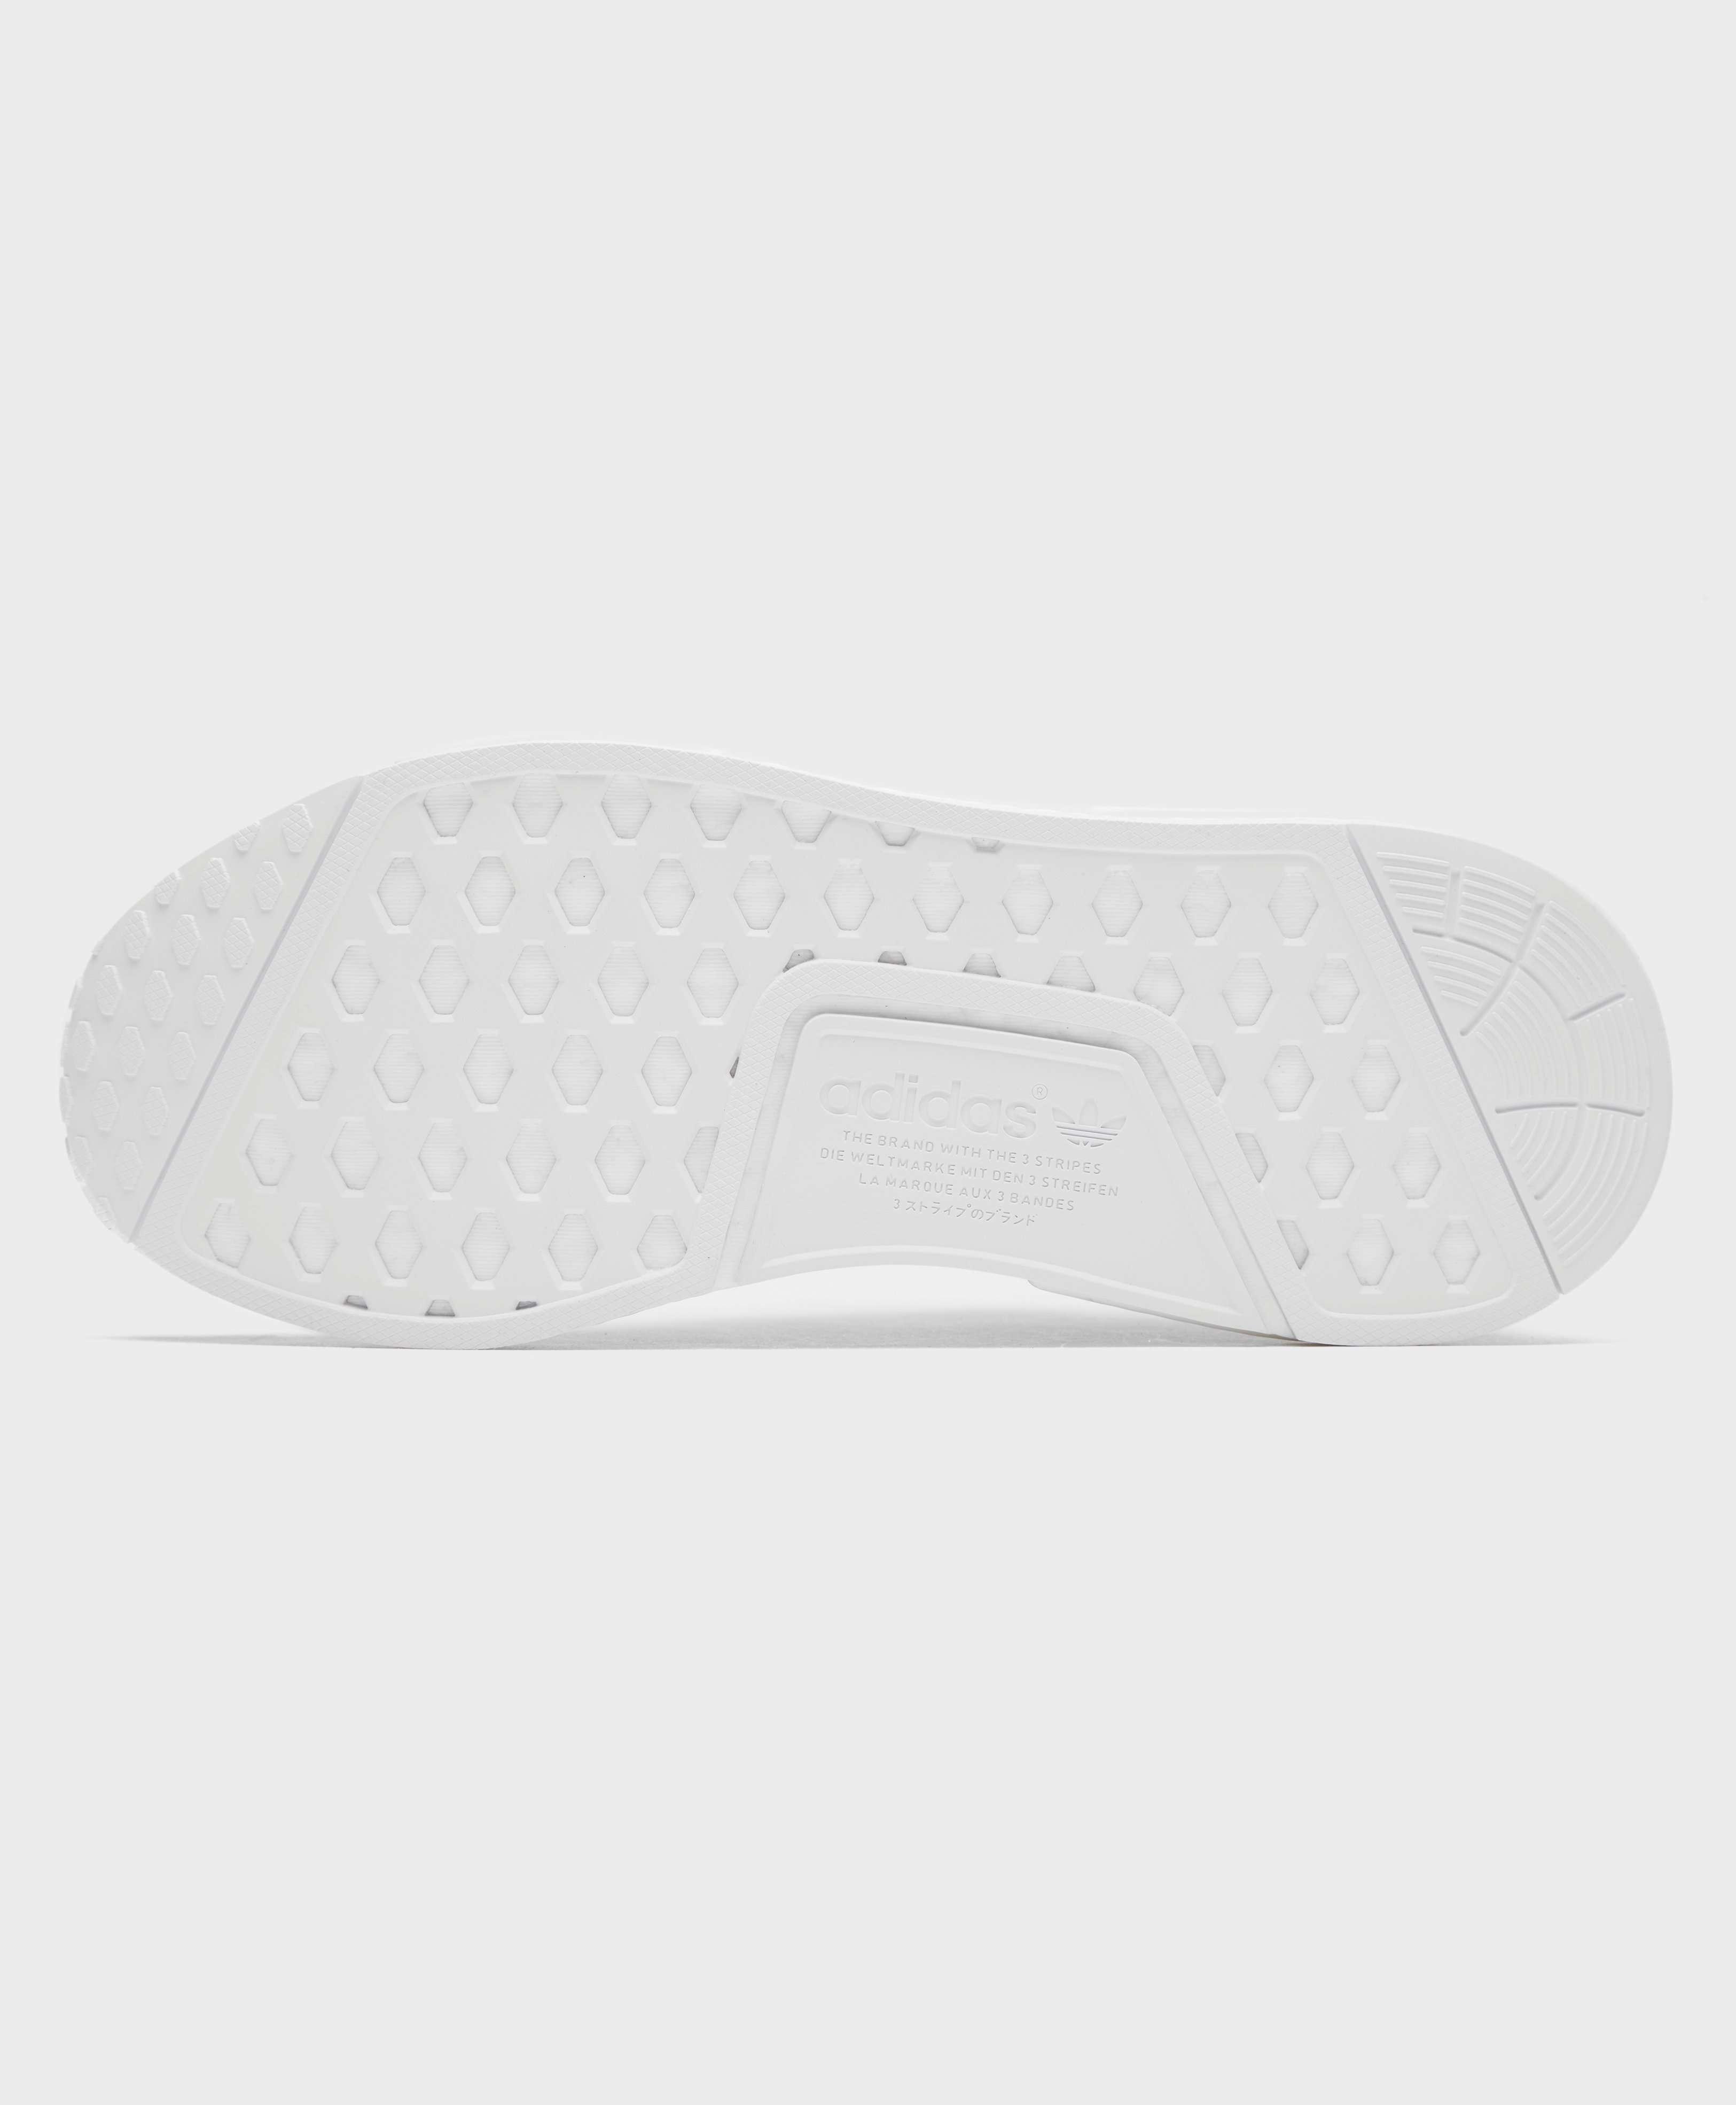 adidas Originals NMD R_1 Primeknit